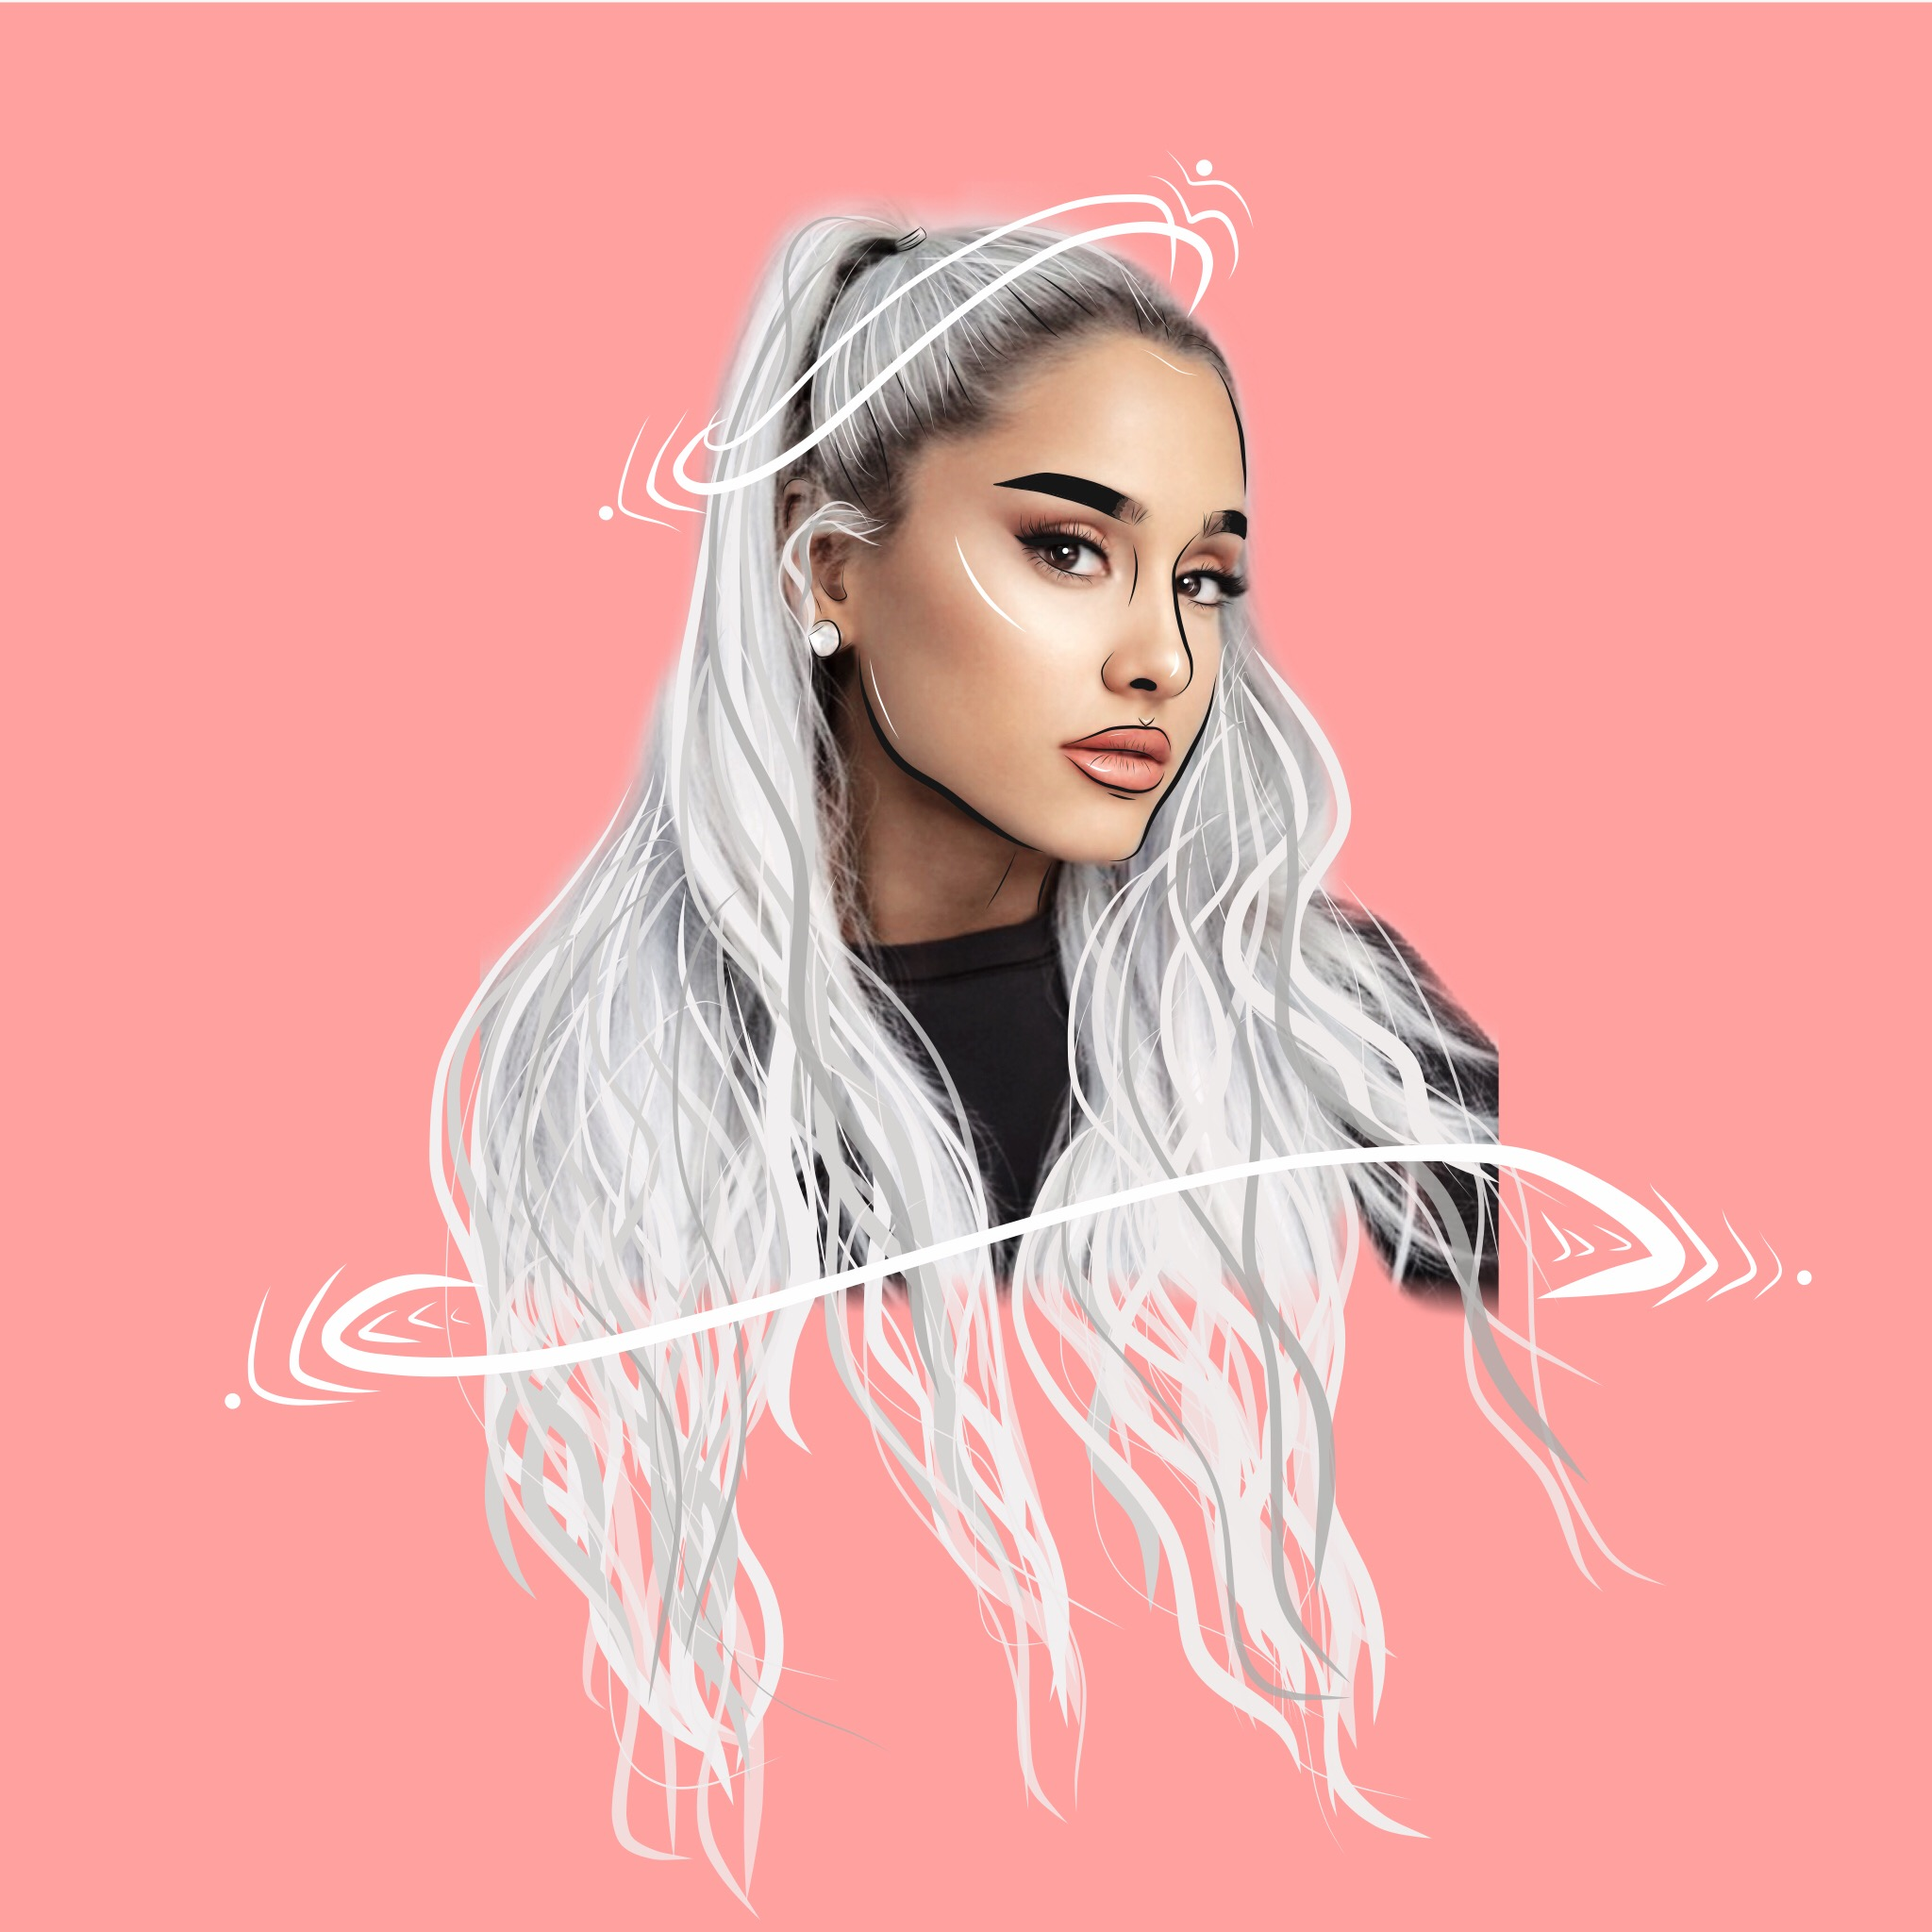 Ariana Grande? #freetoedit #arianagrande #arianagrandeedit #leaelui #lorengray #outline #outlineedit #outlinedit #arianators